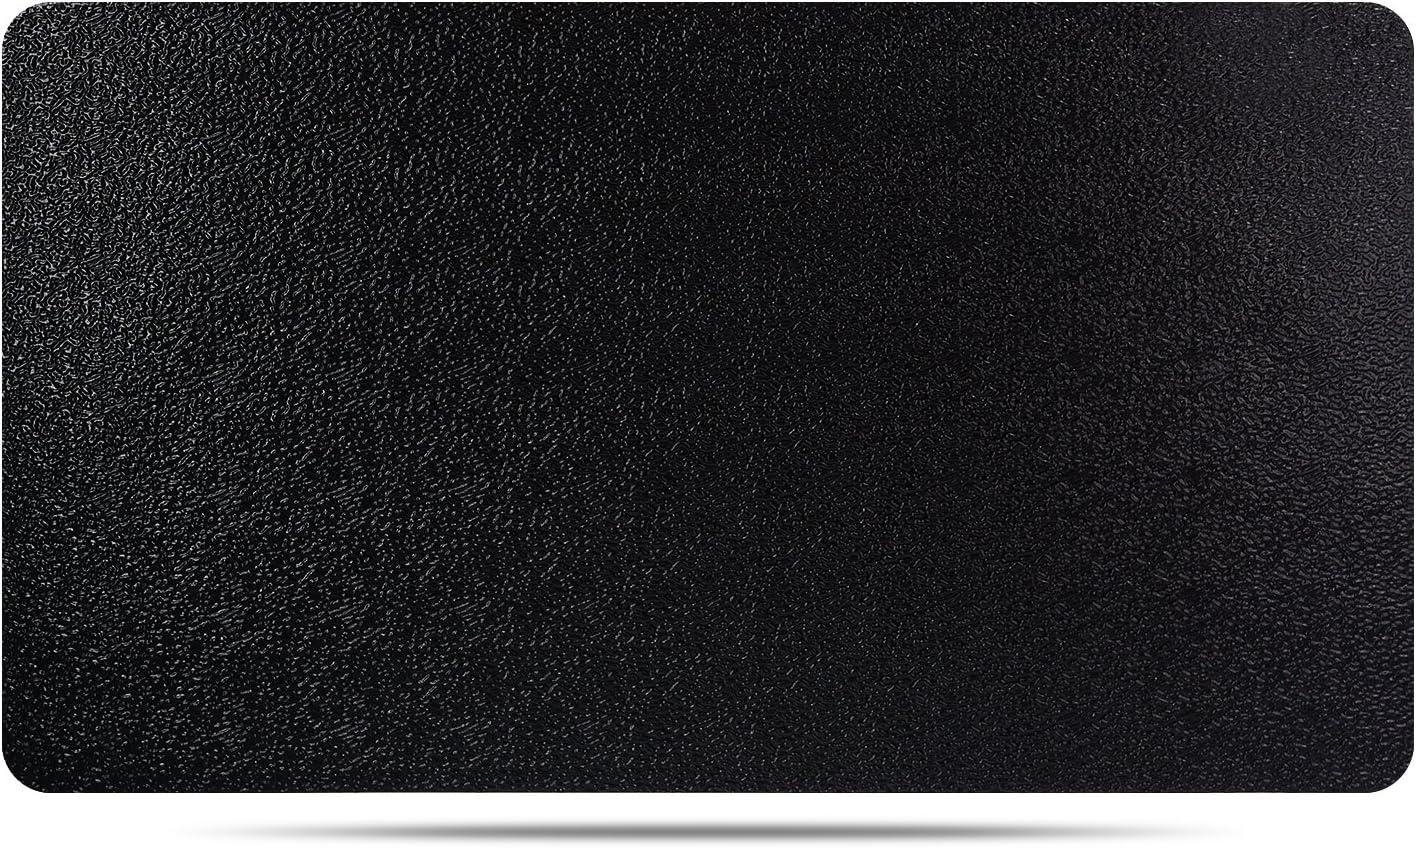 iSaddle Anti-Slip Mat Extra Large Car Dashboard Silica Gel Magic Sticky SM041